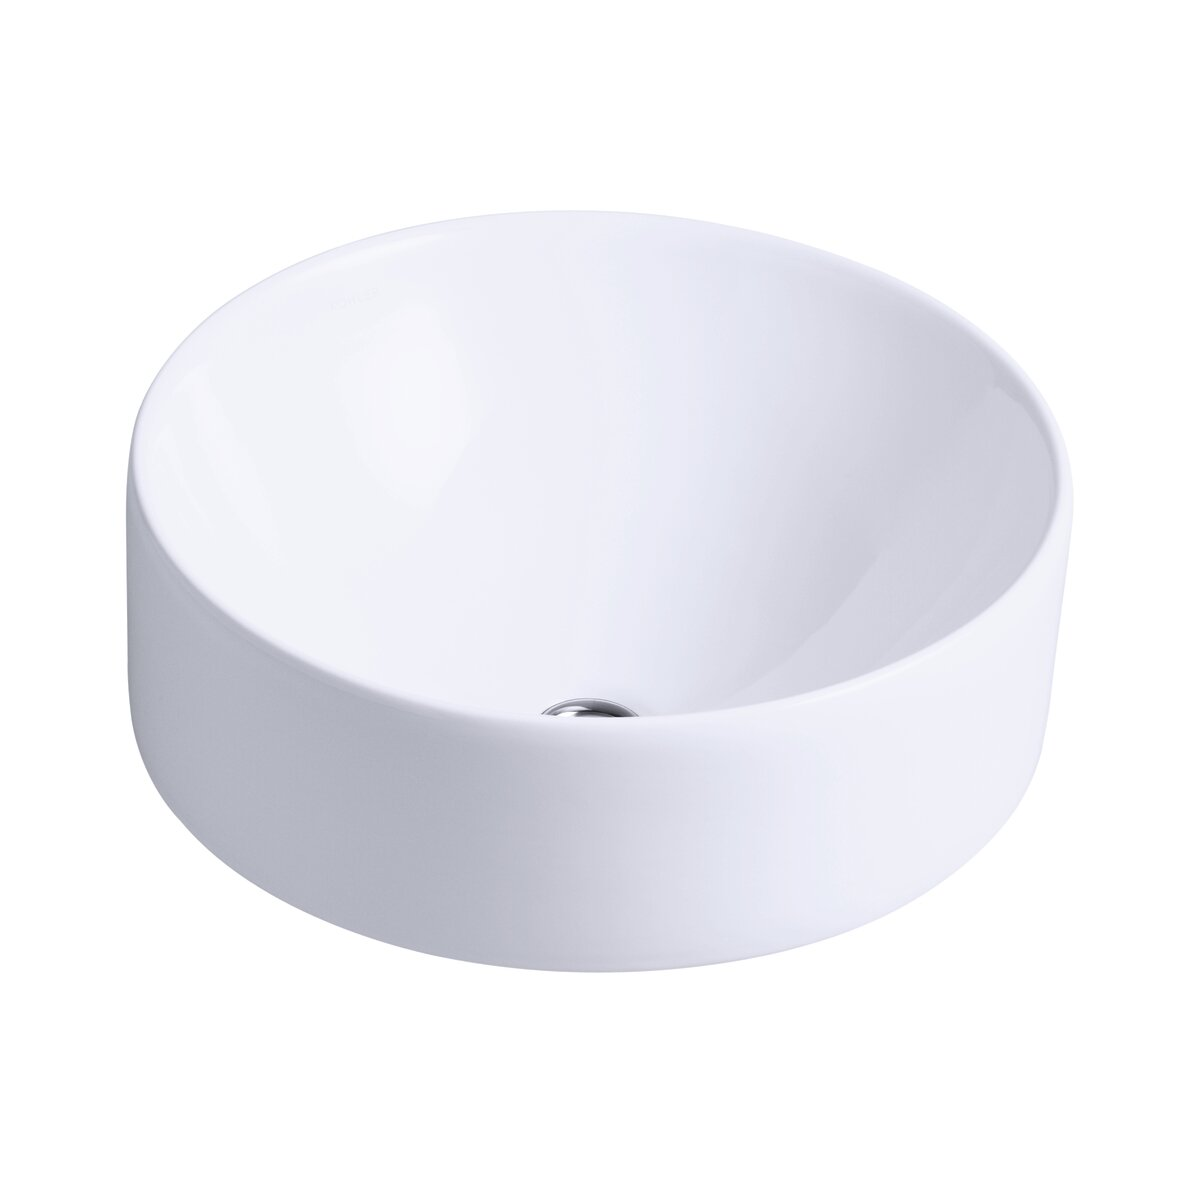 Delicieux K 14800 0,47,7 Kohler Vox Ceramic Circular Vessel Bathroom Sink With  Overflow U0026 Reviews   Wayfair